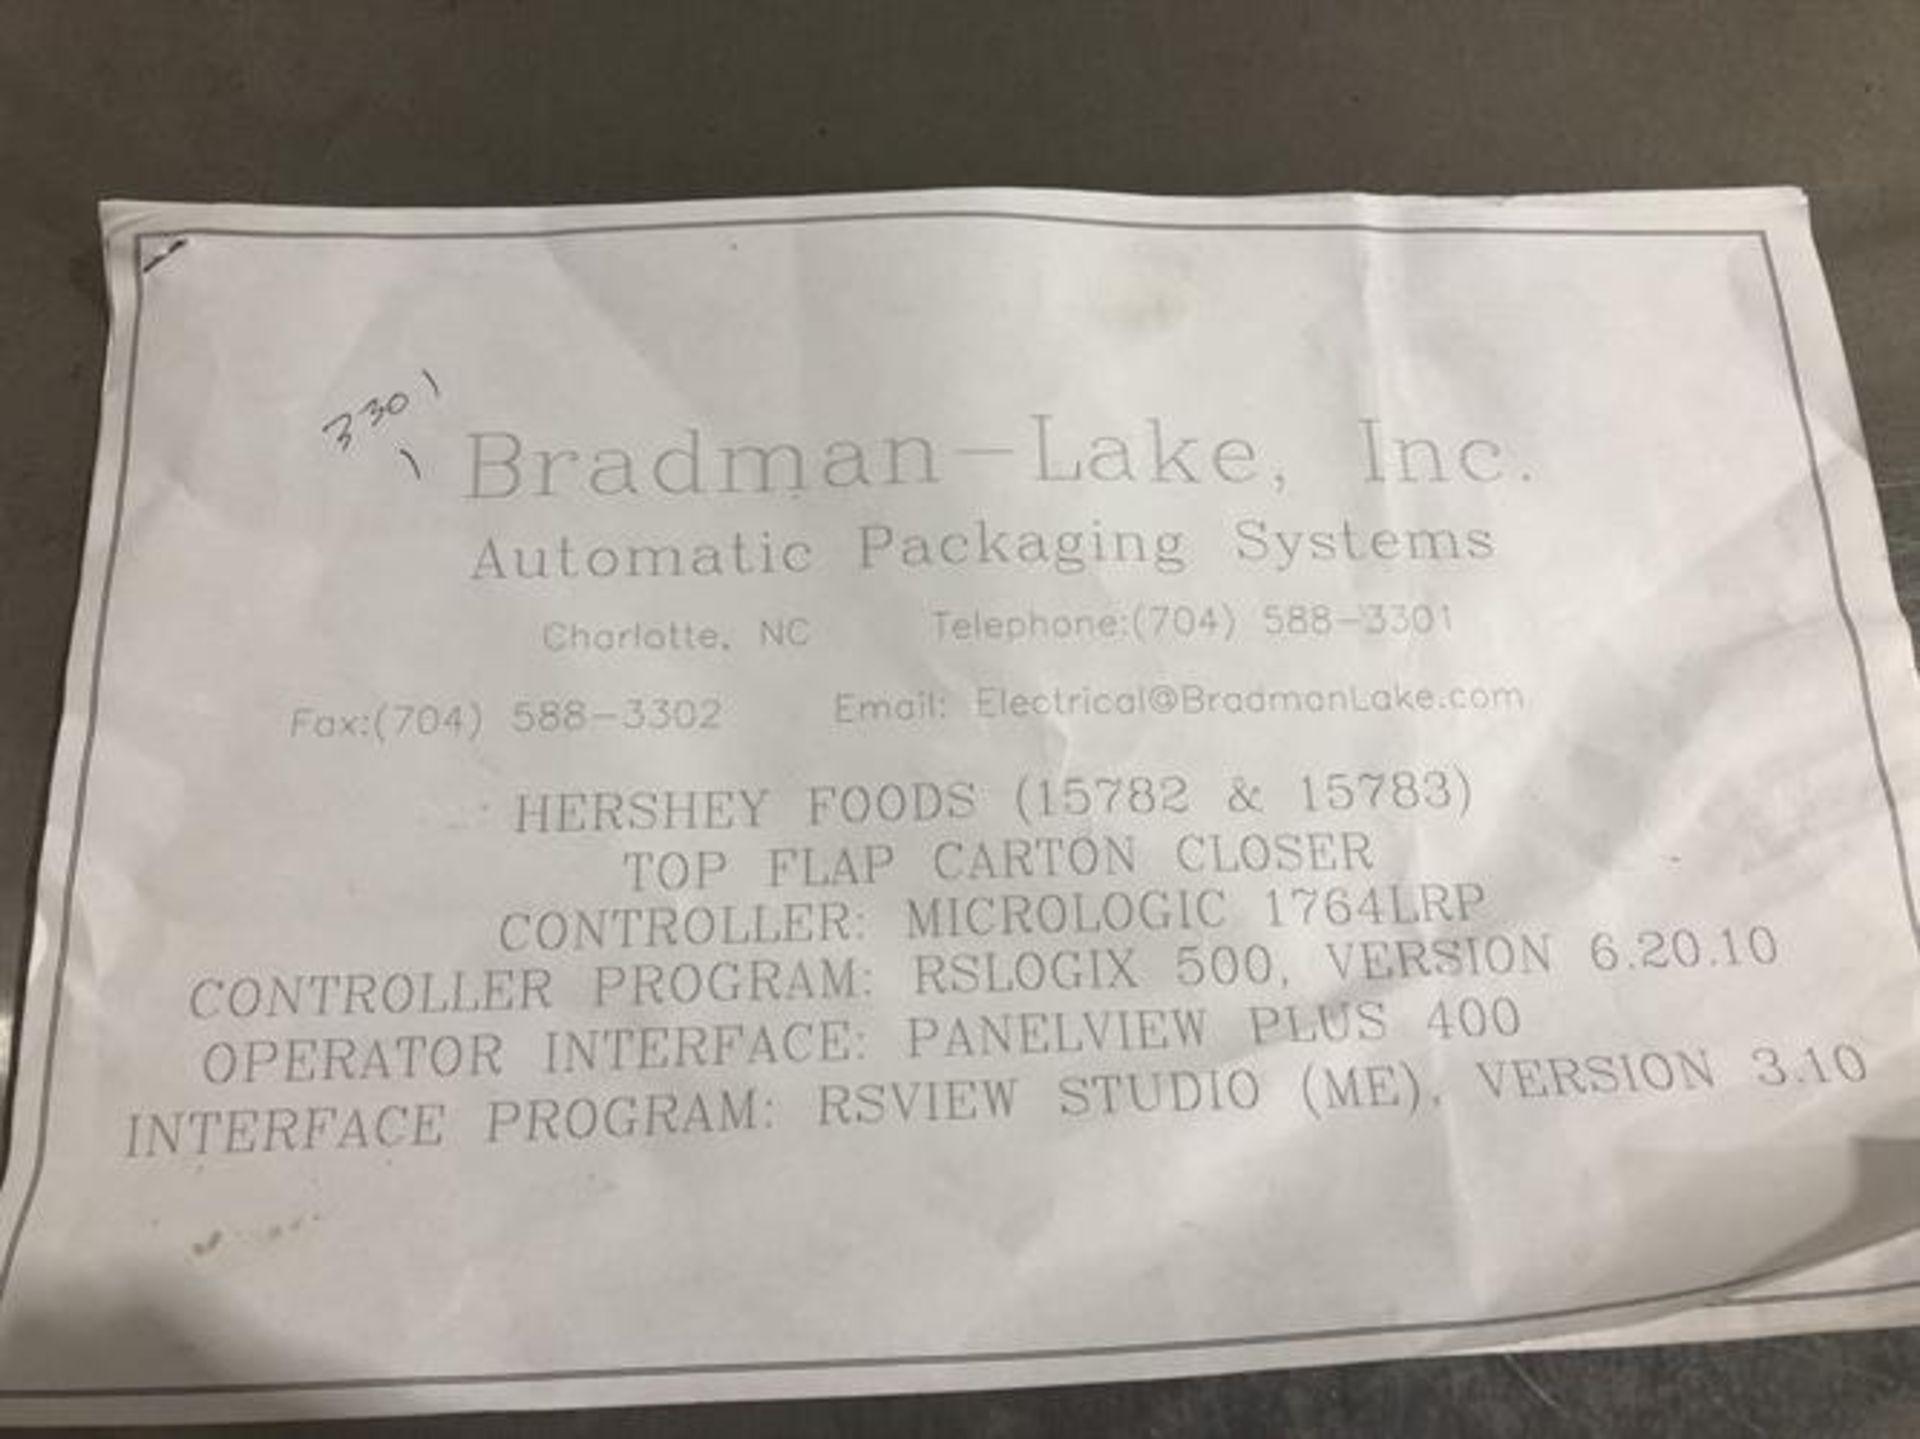 Bradman Lake inline Top Flap Sealer carton closer - Nordson Hot Melt - Allen Bradley Panelview - Image 16 of 19